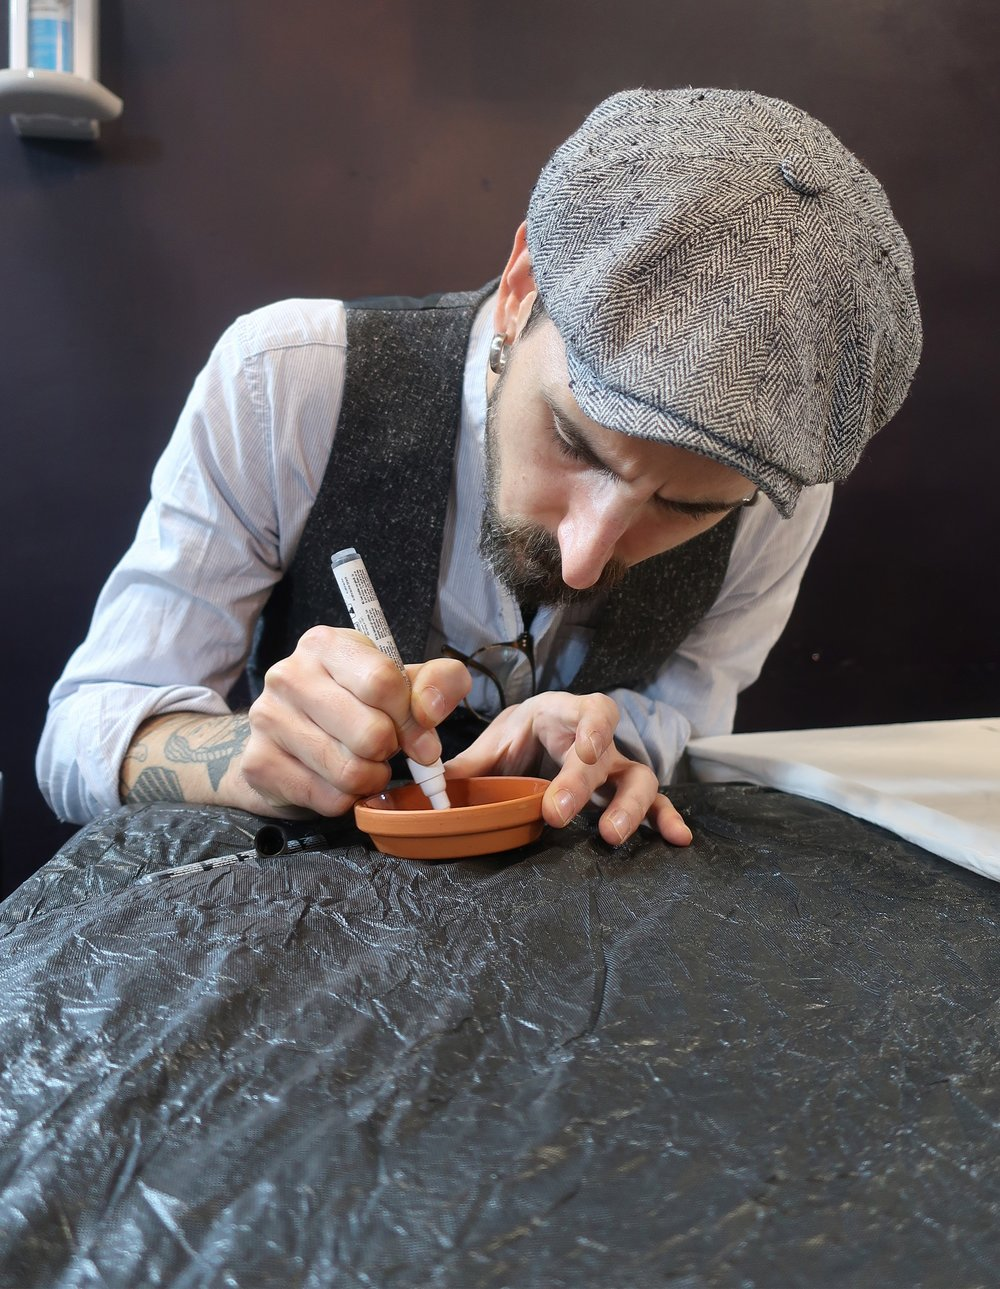 Artist Adria Deyza painting on pottery.jpeg